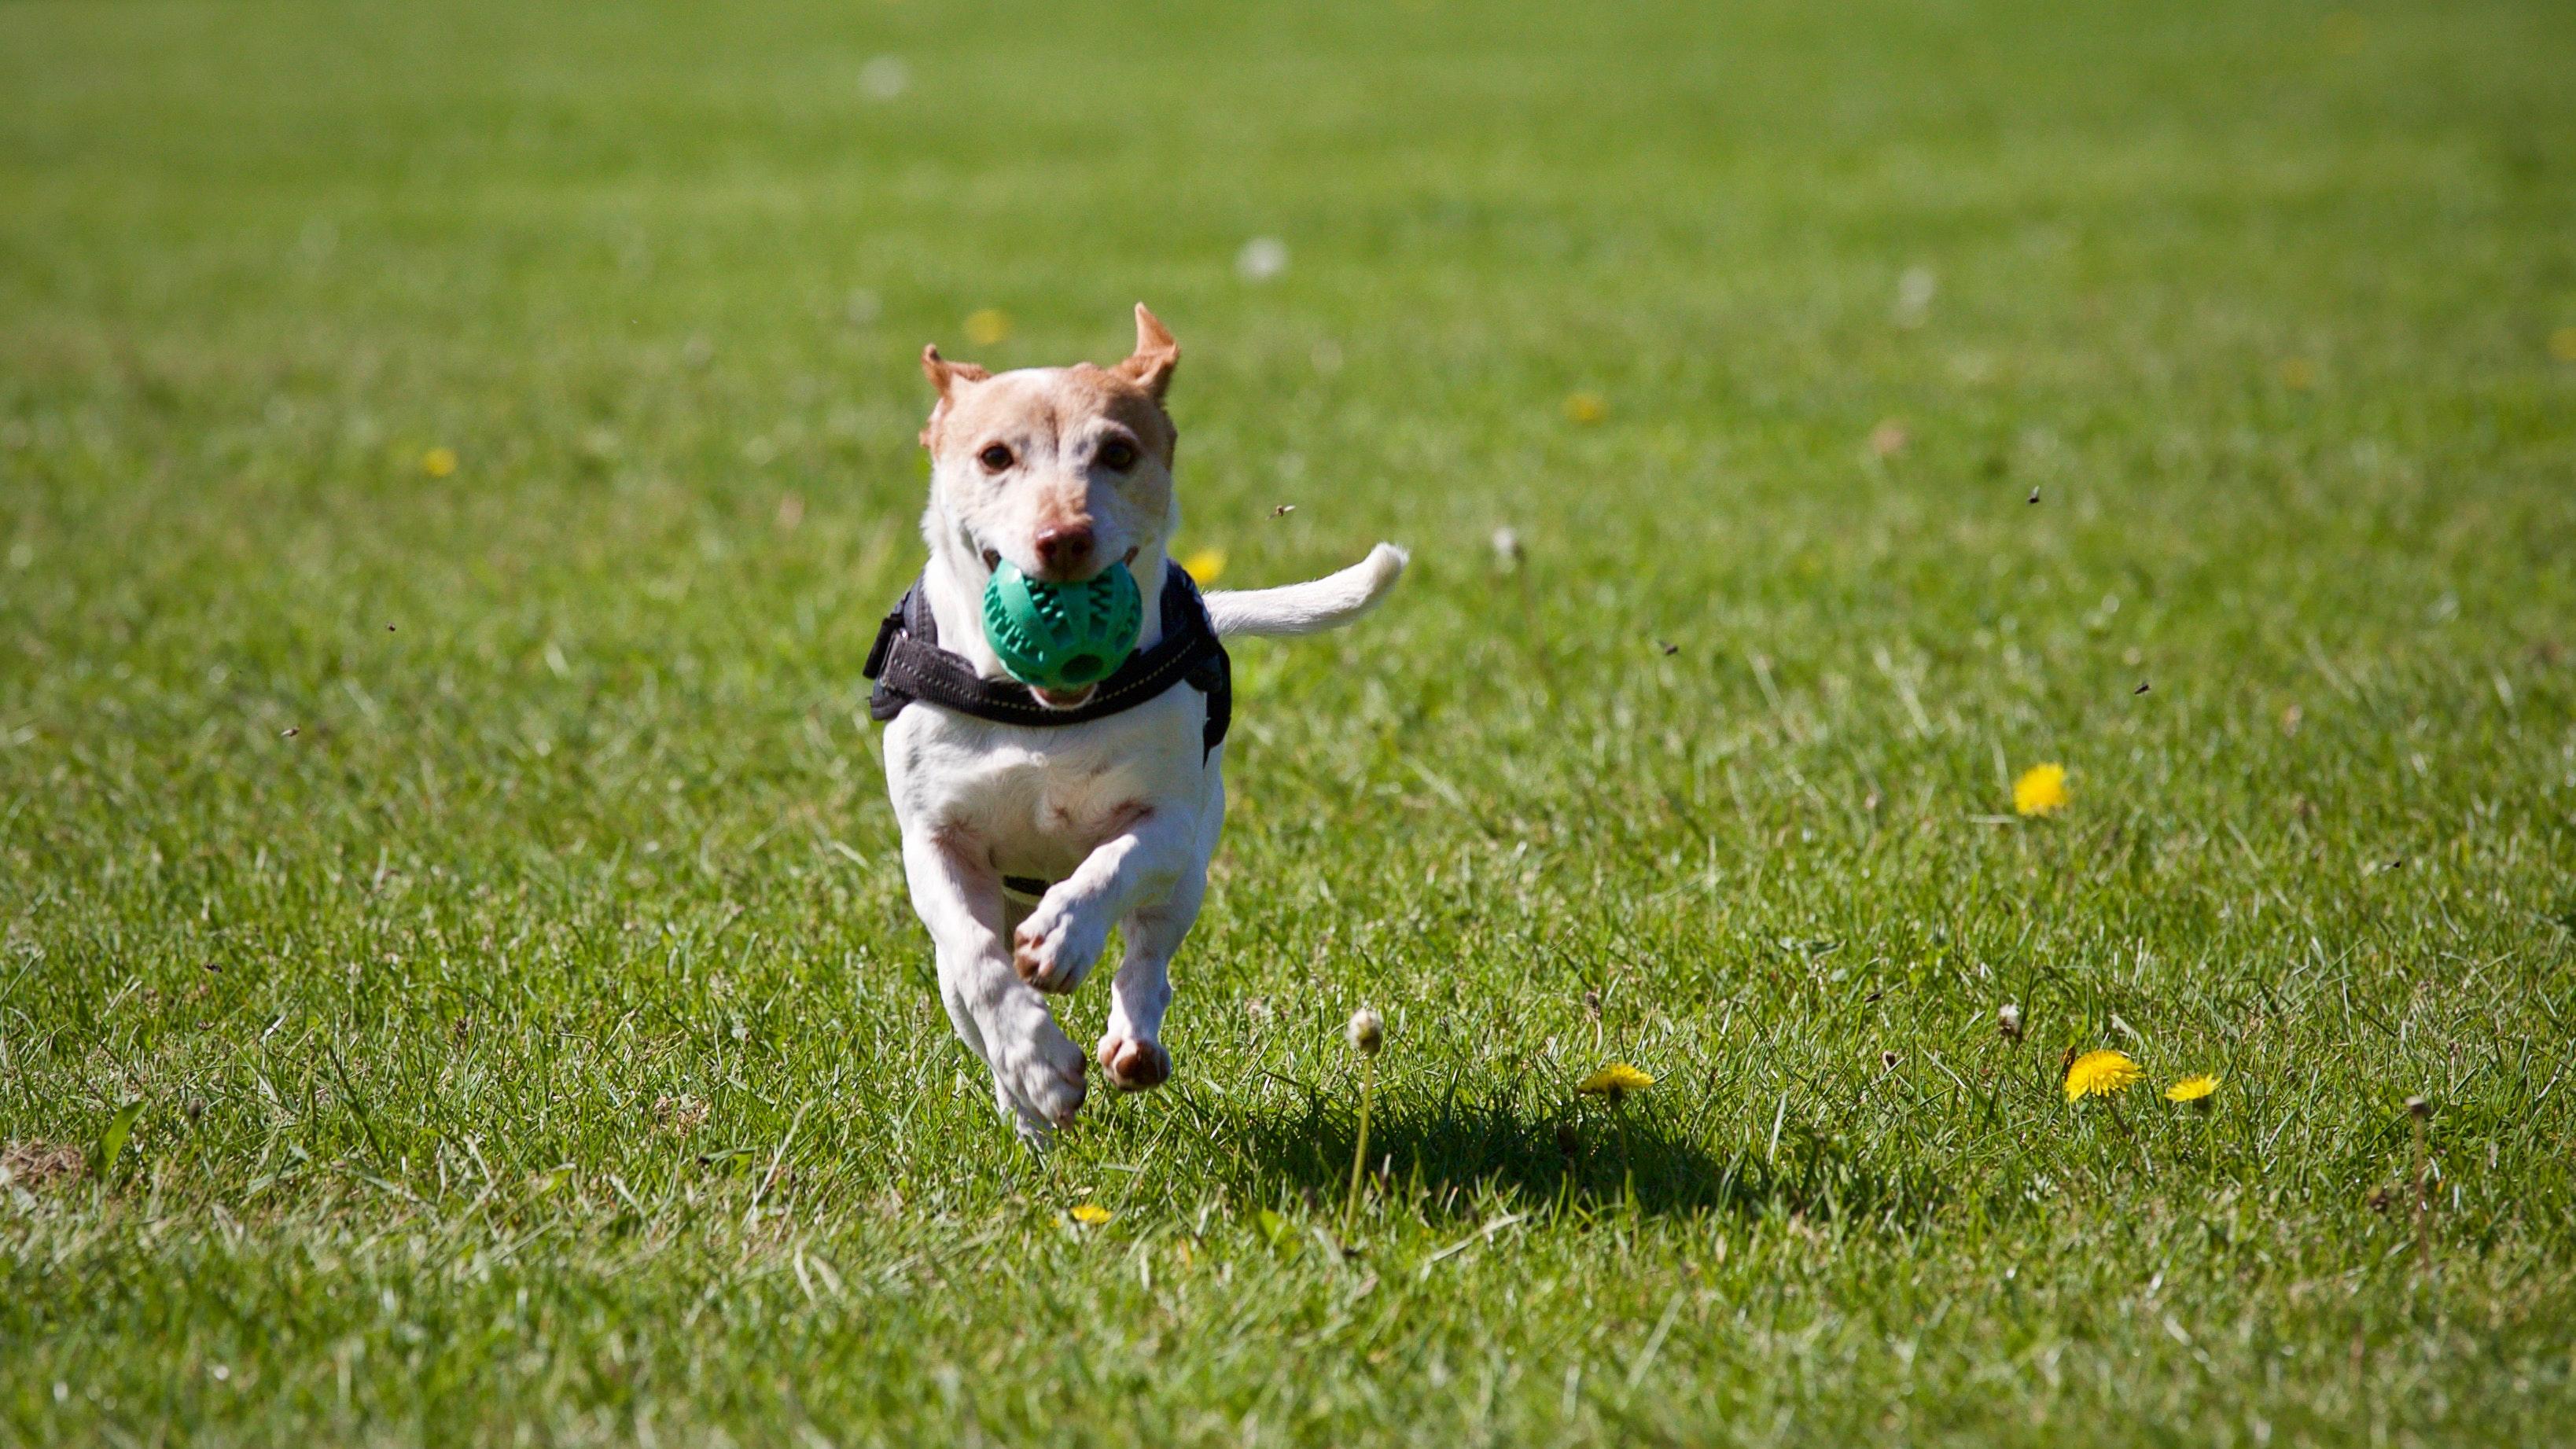 Dog fetch in park